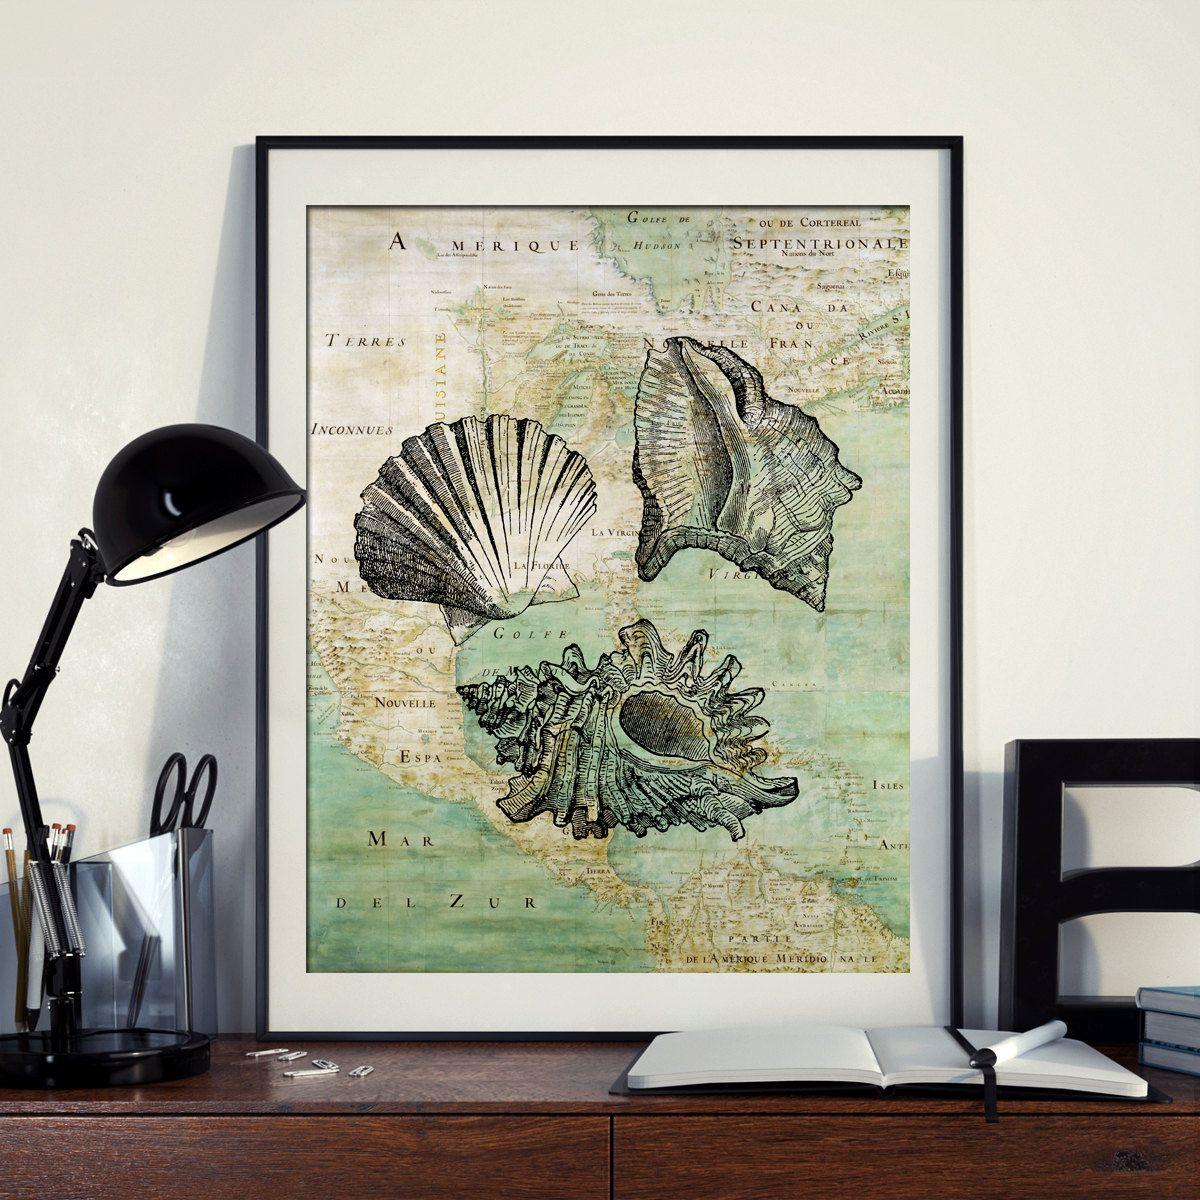 Vintage Map Of North America Shell Seashells Sea Ocean Seaside - Download map of north america